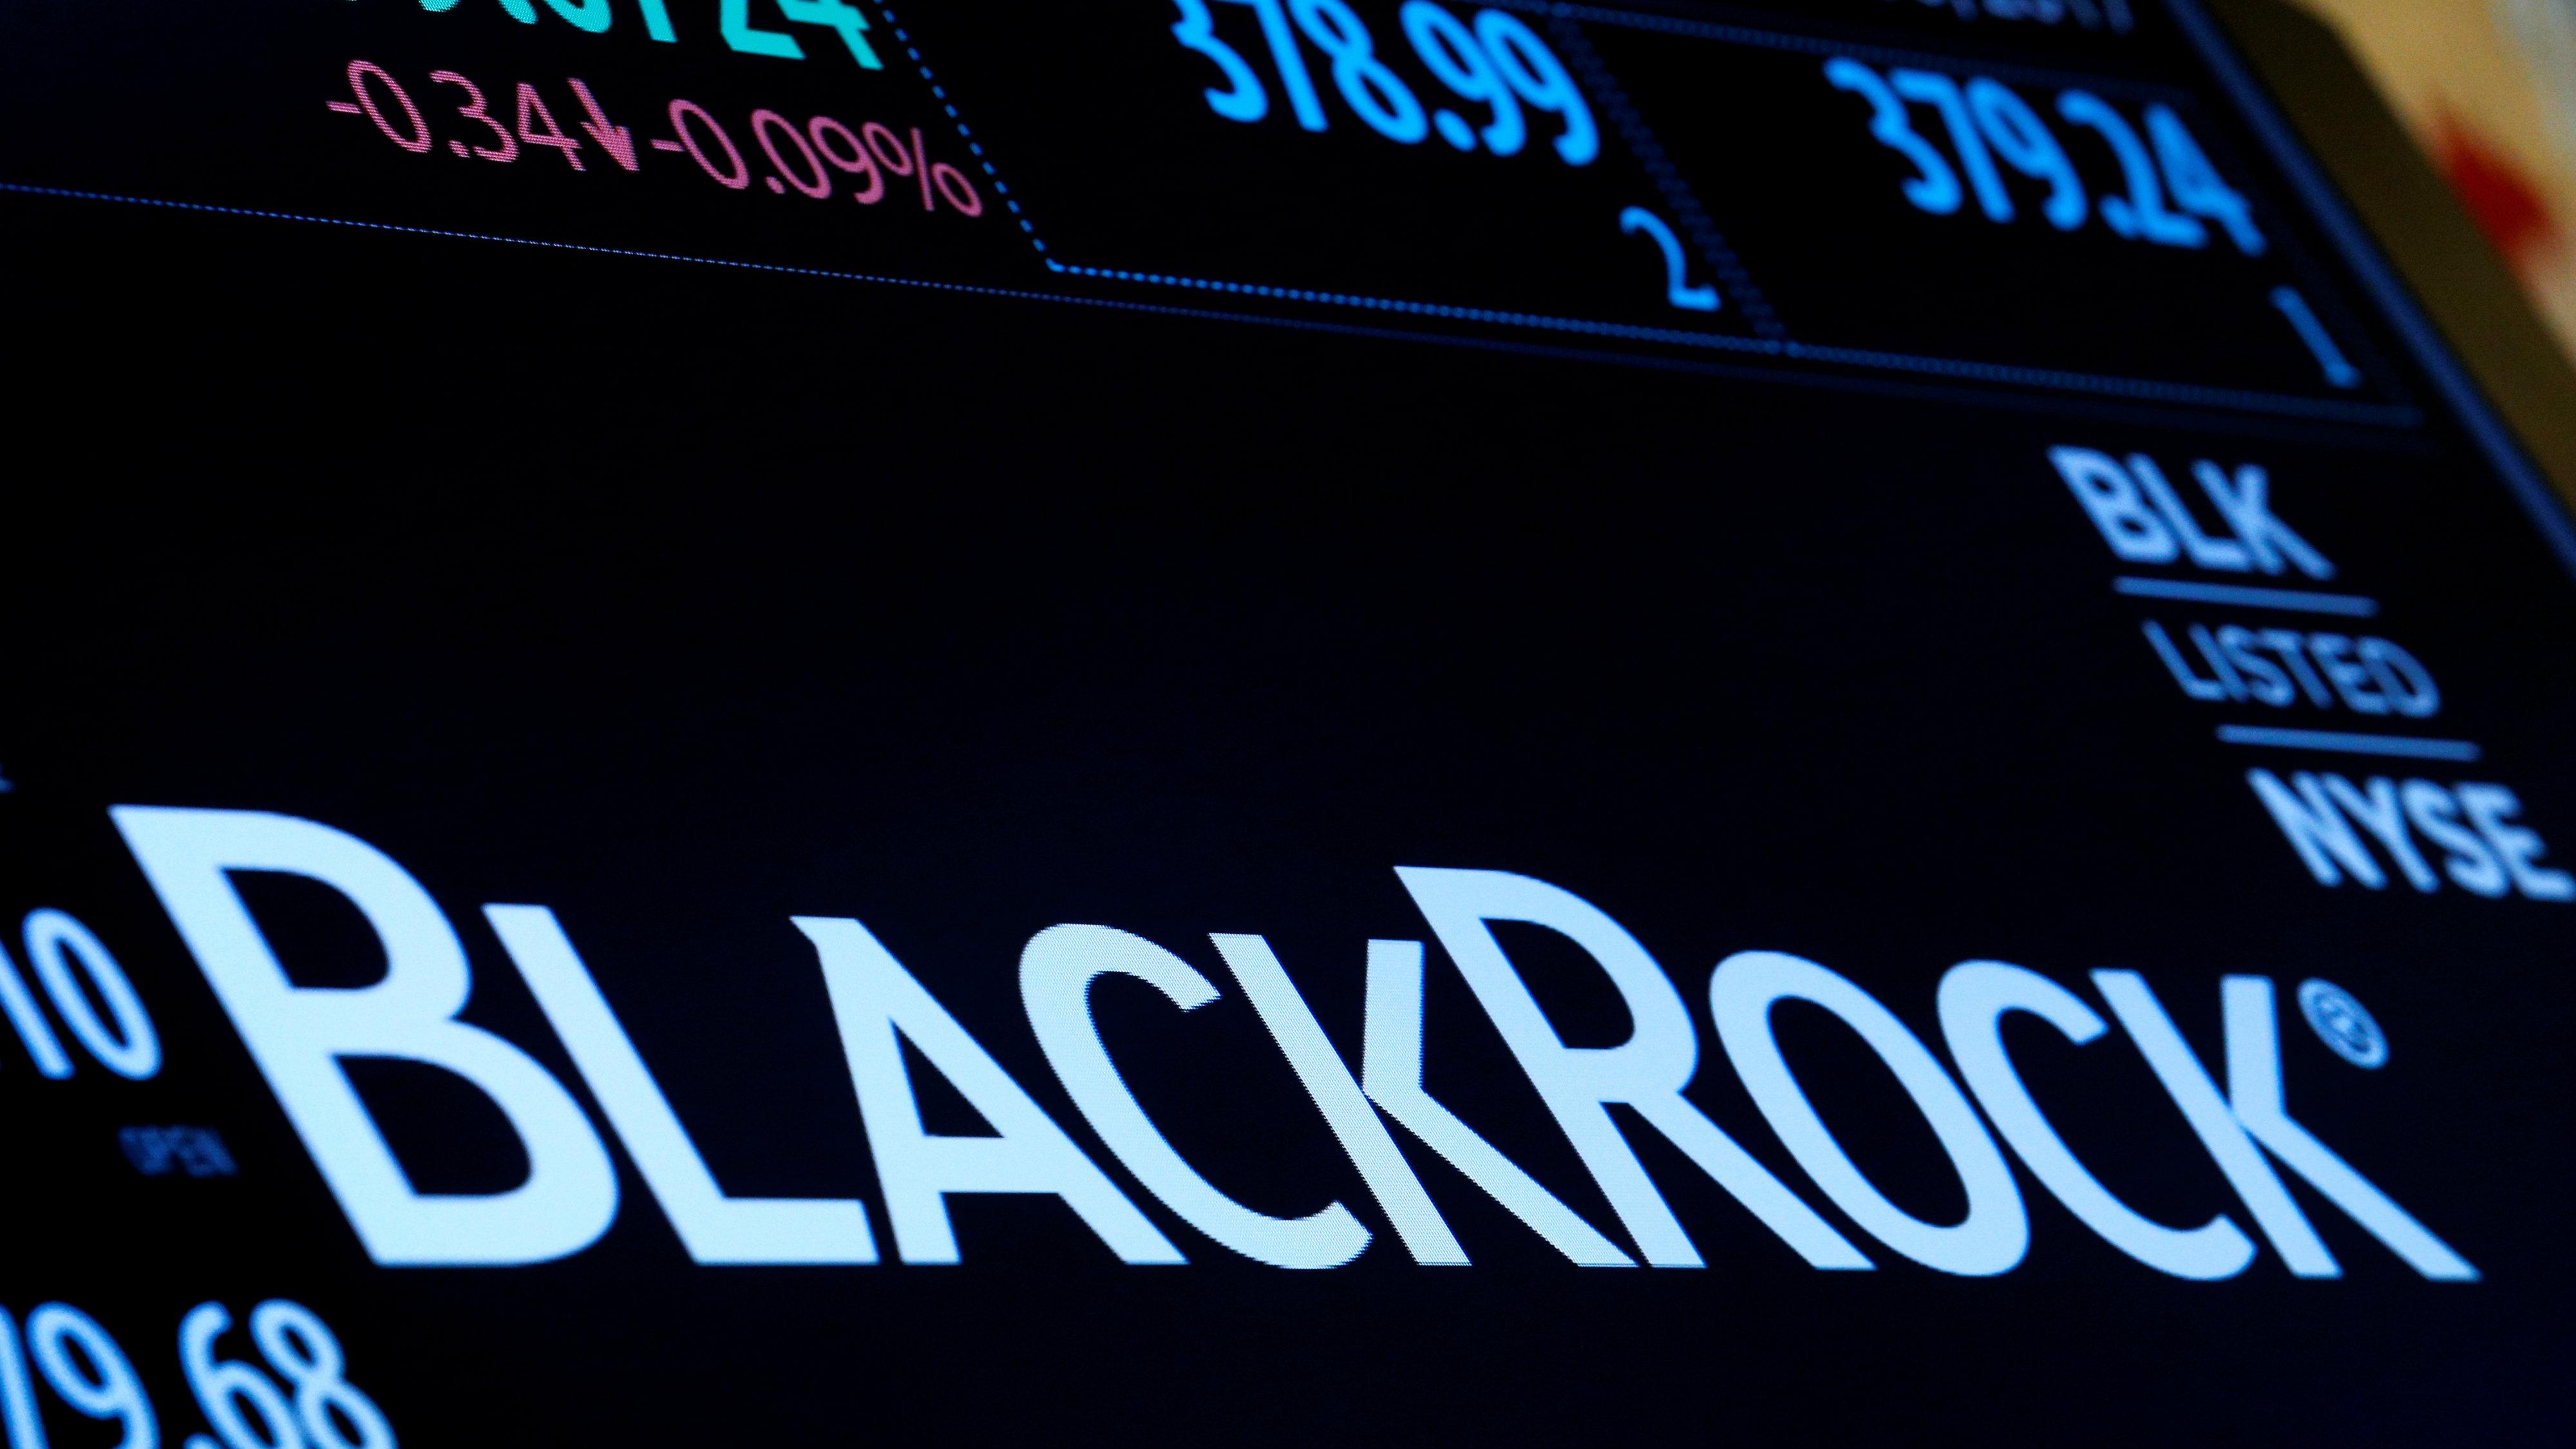 BlackRock's list of climate commitments just got longer thumbnail